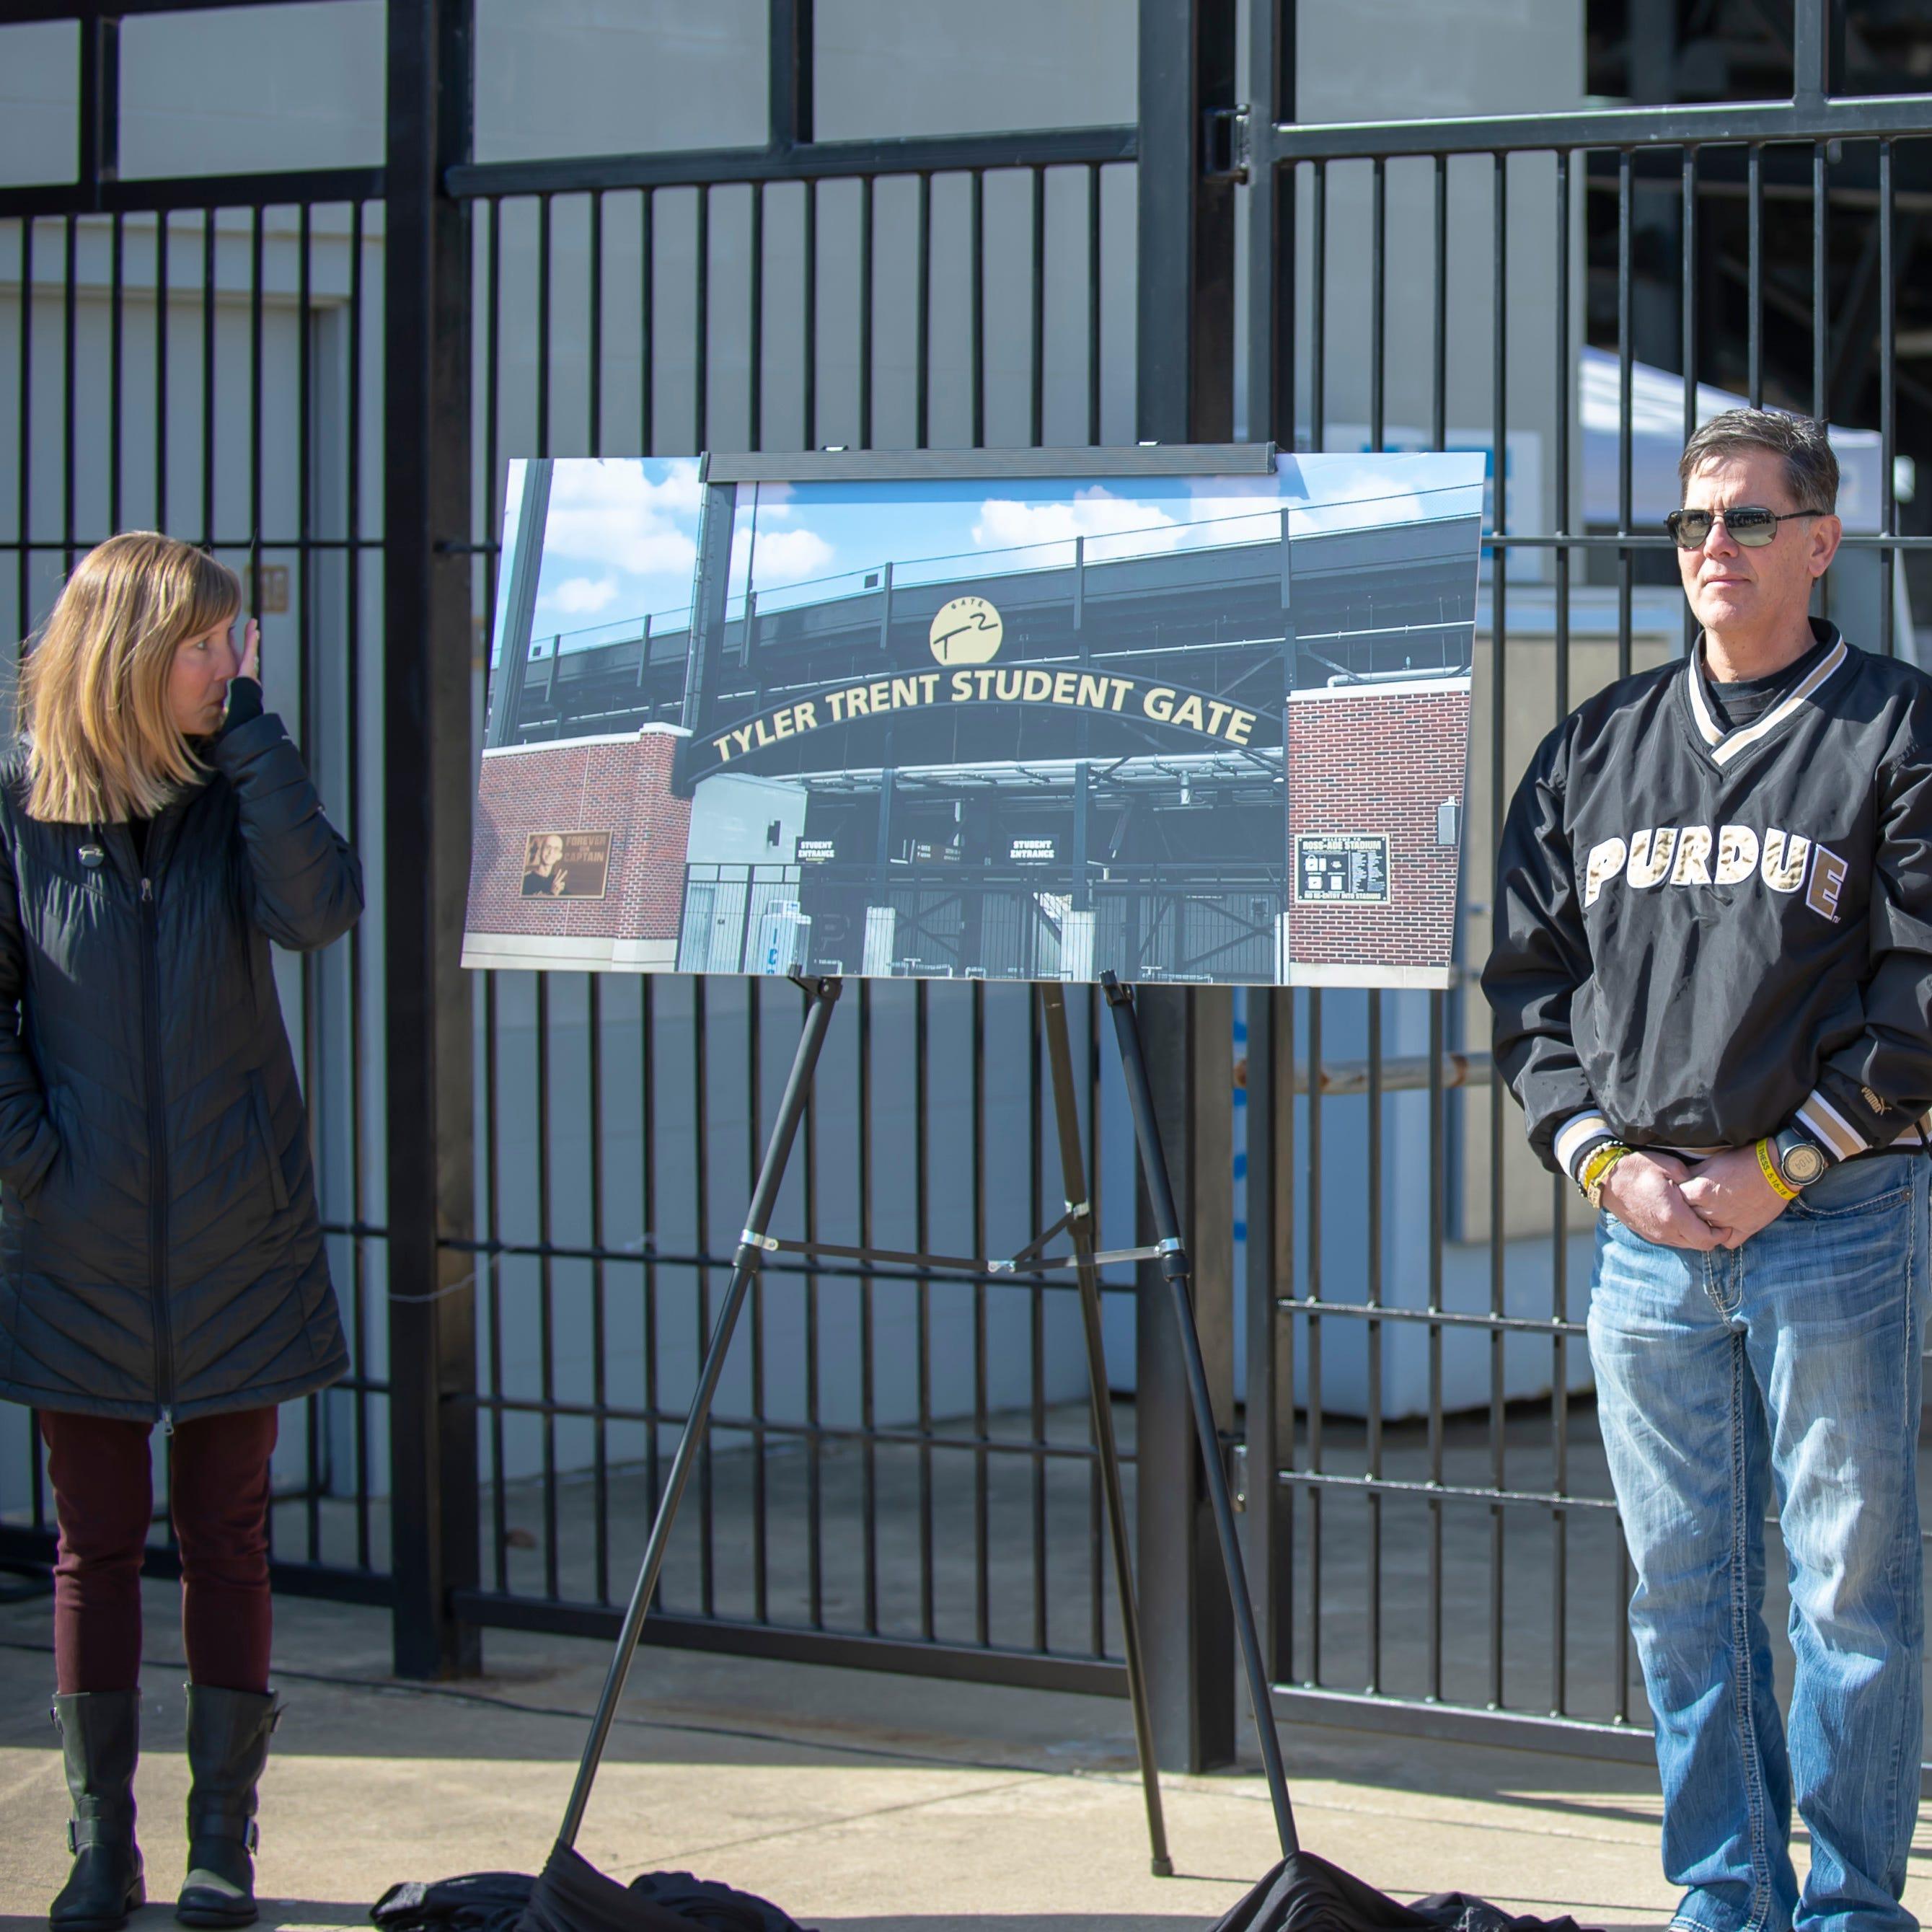 'This is Tyler': Purdue names Ross-Ade Stadium gate for Tyler Trent